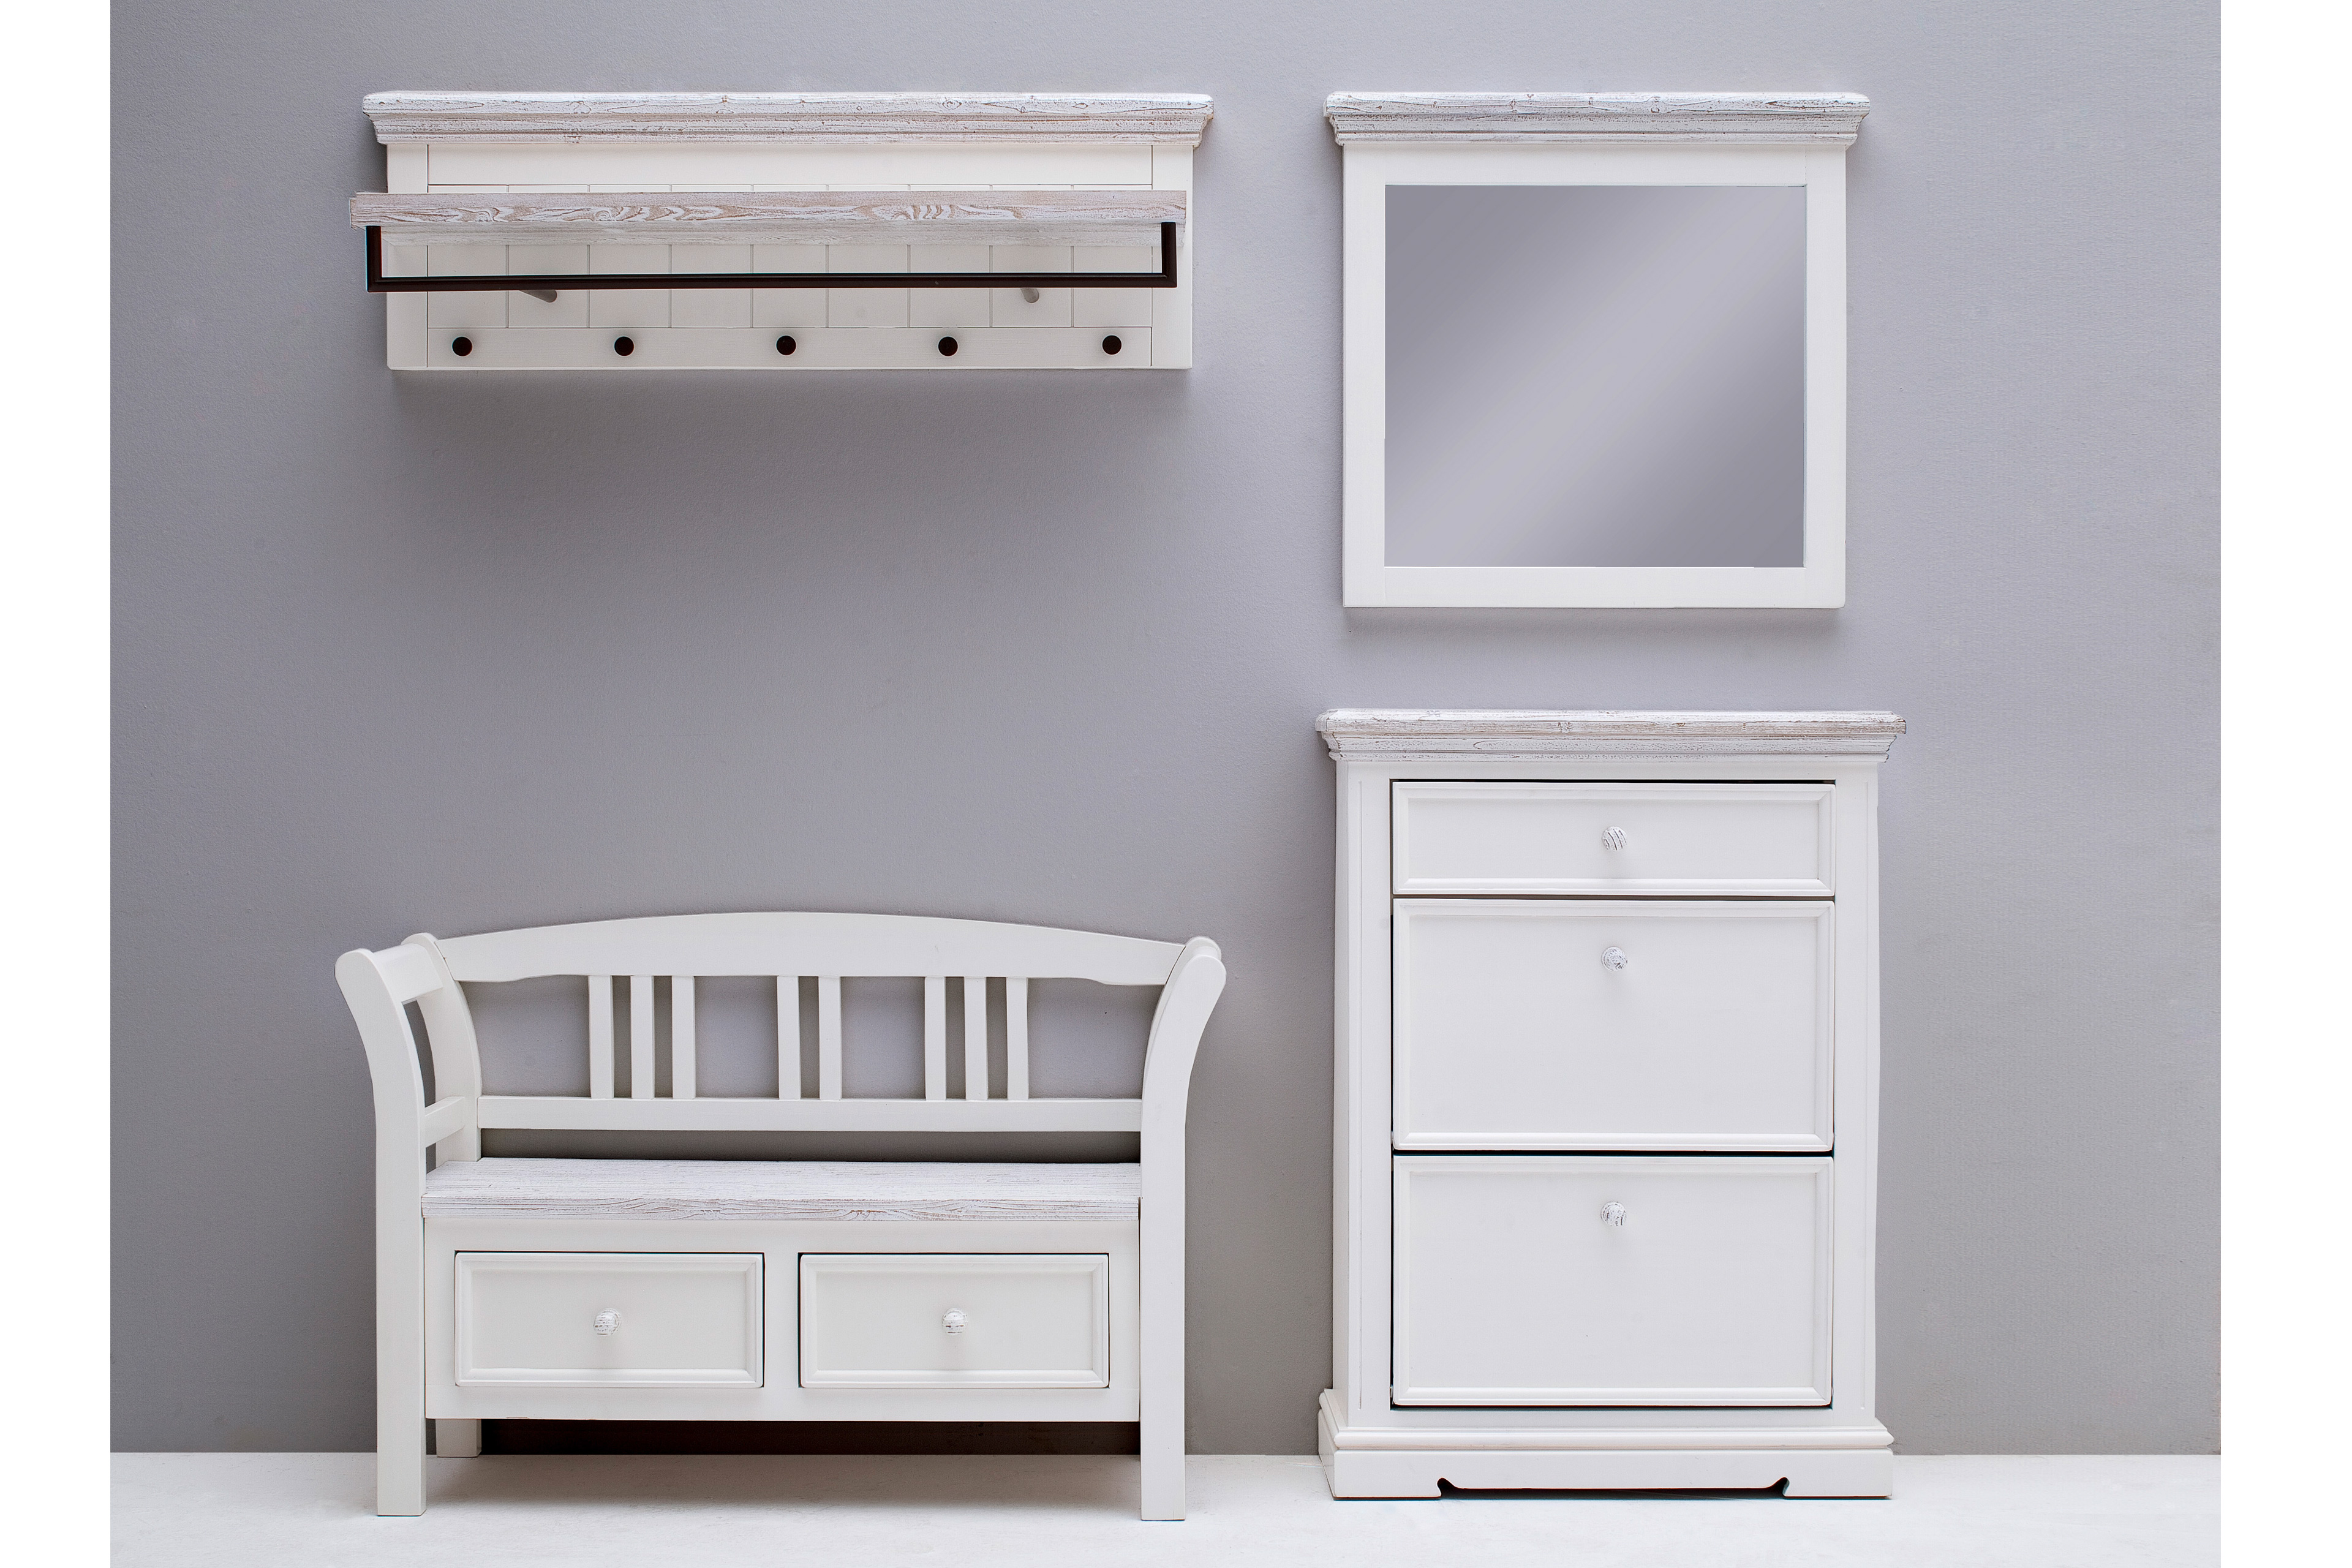 Garderobe opus osita kiefer wei massiv mca furniture for Garderobe kiefer